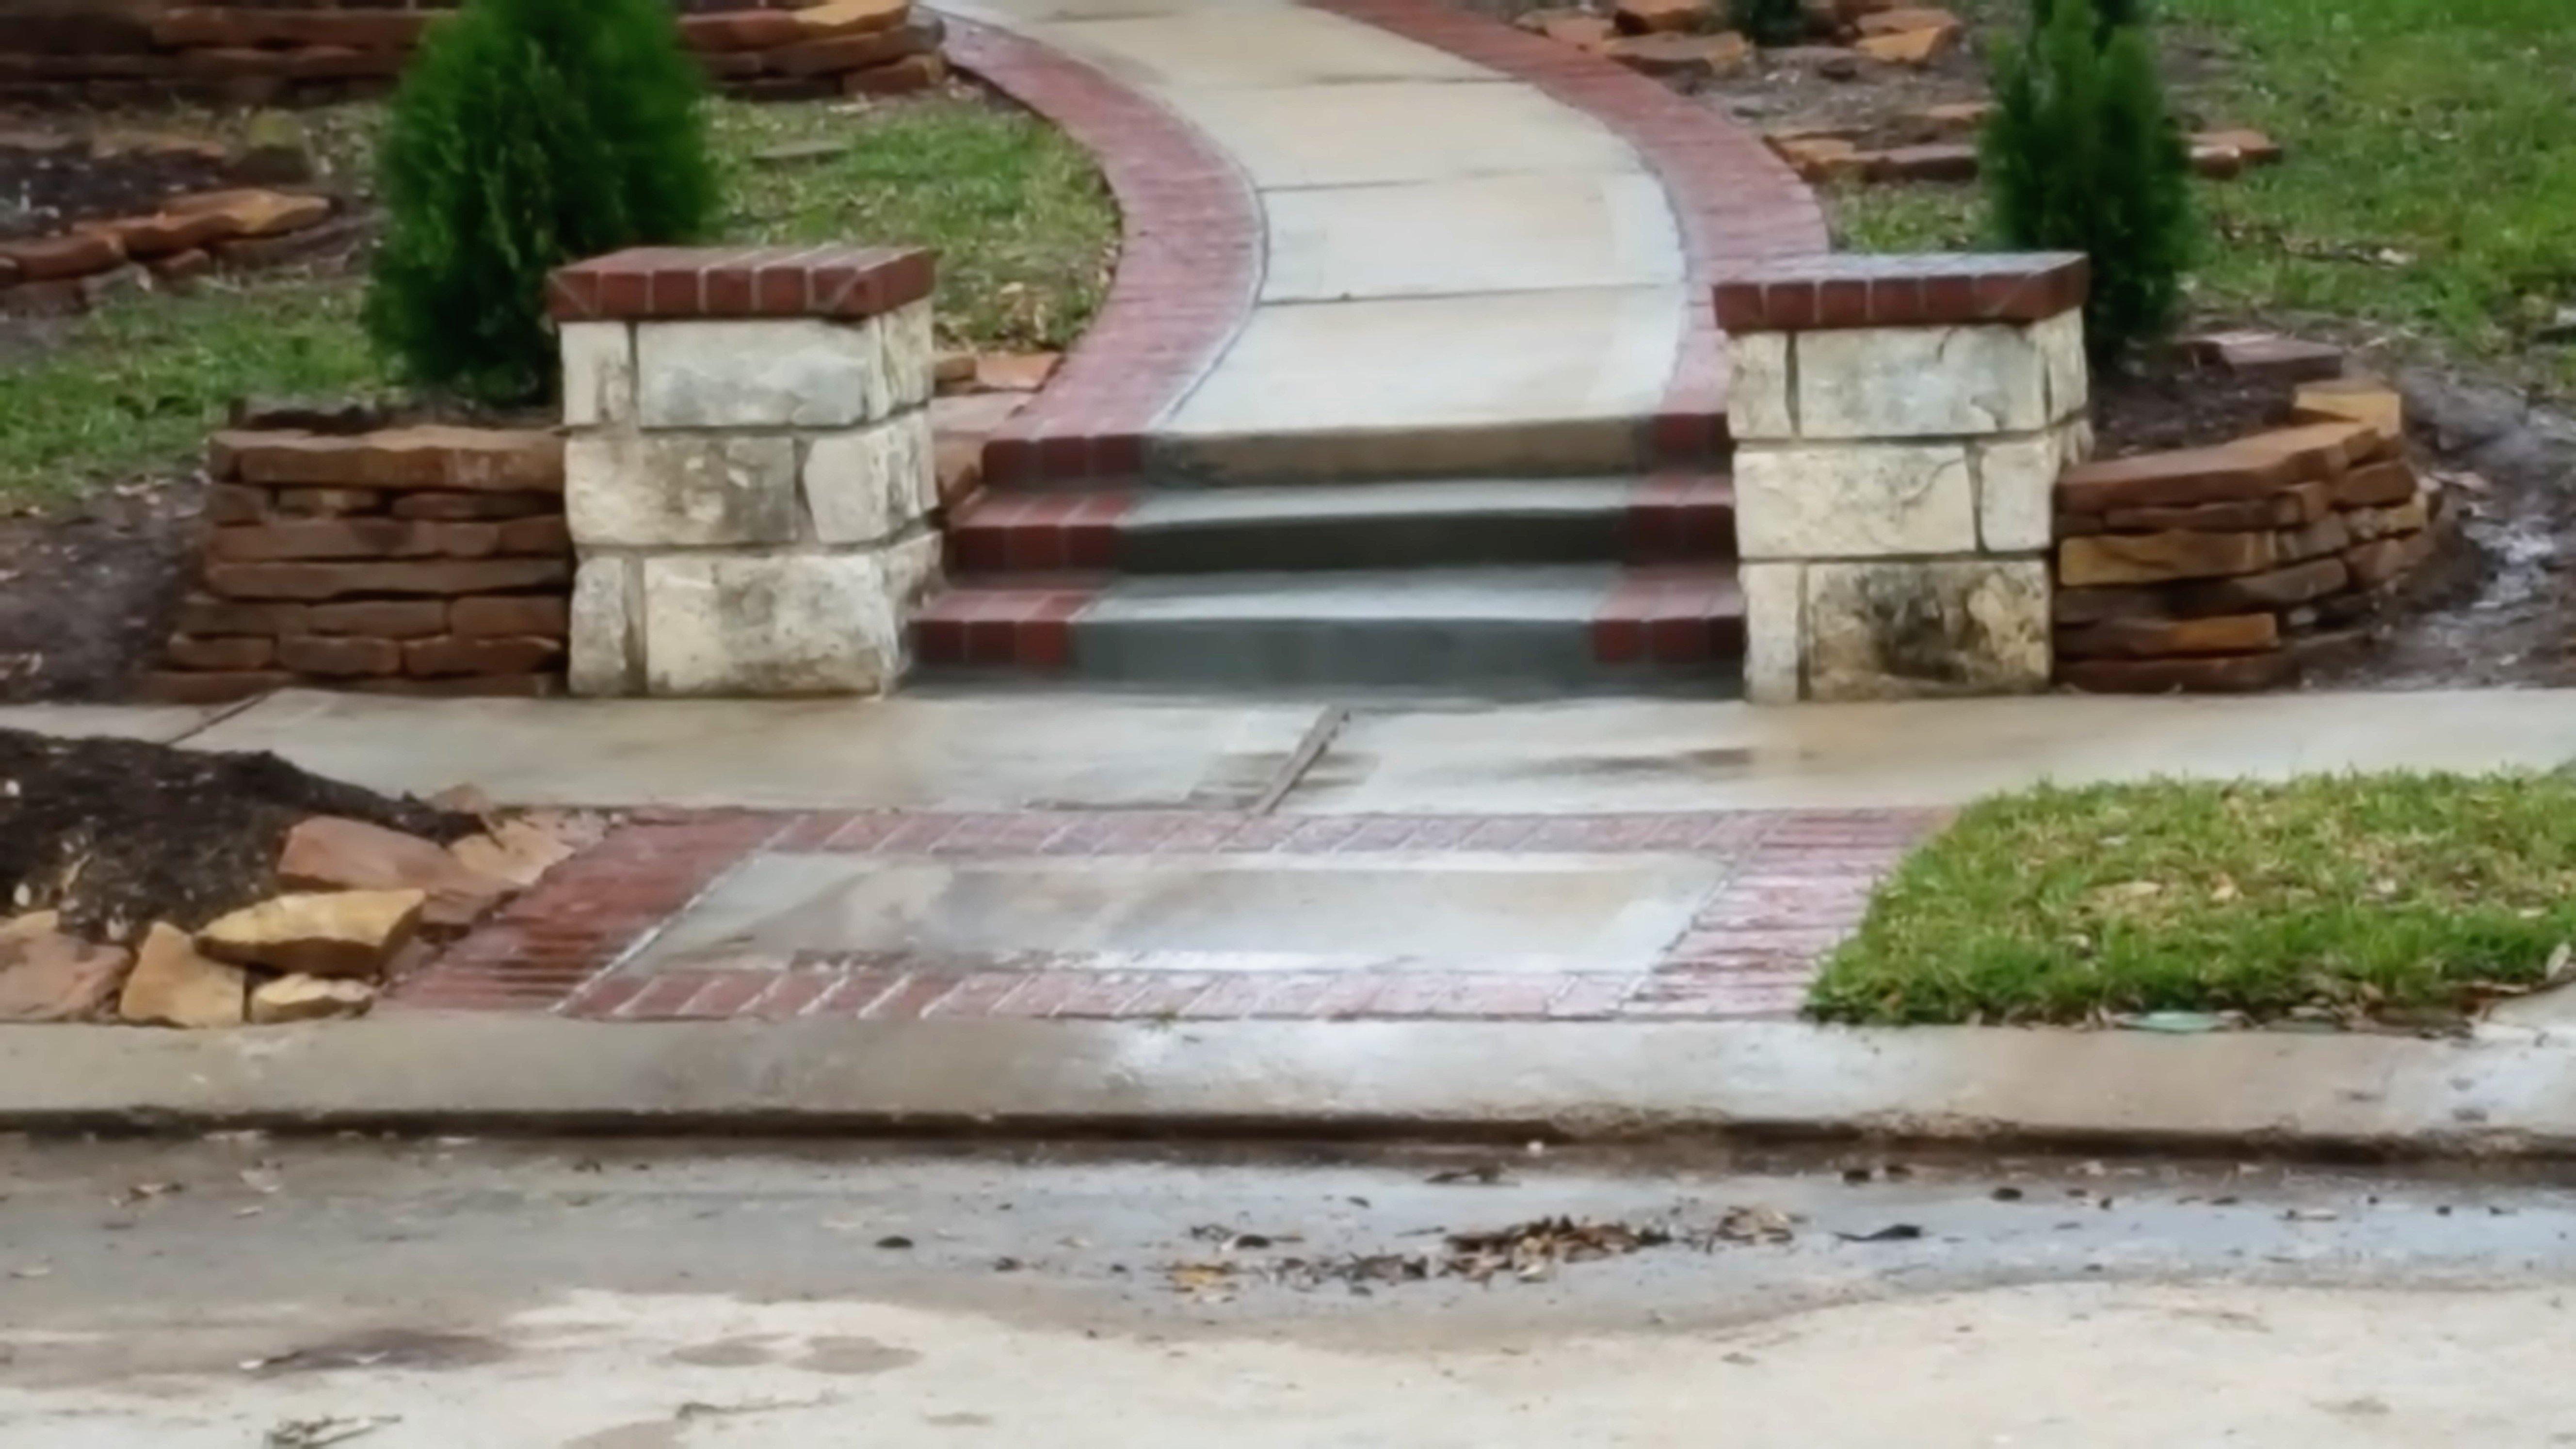 masonry brick stair repair, restore brick stairs, brick restored, mortar , concrete steps walls, in SPRING,tx., Woodlands, TX.